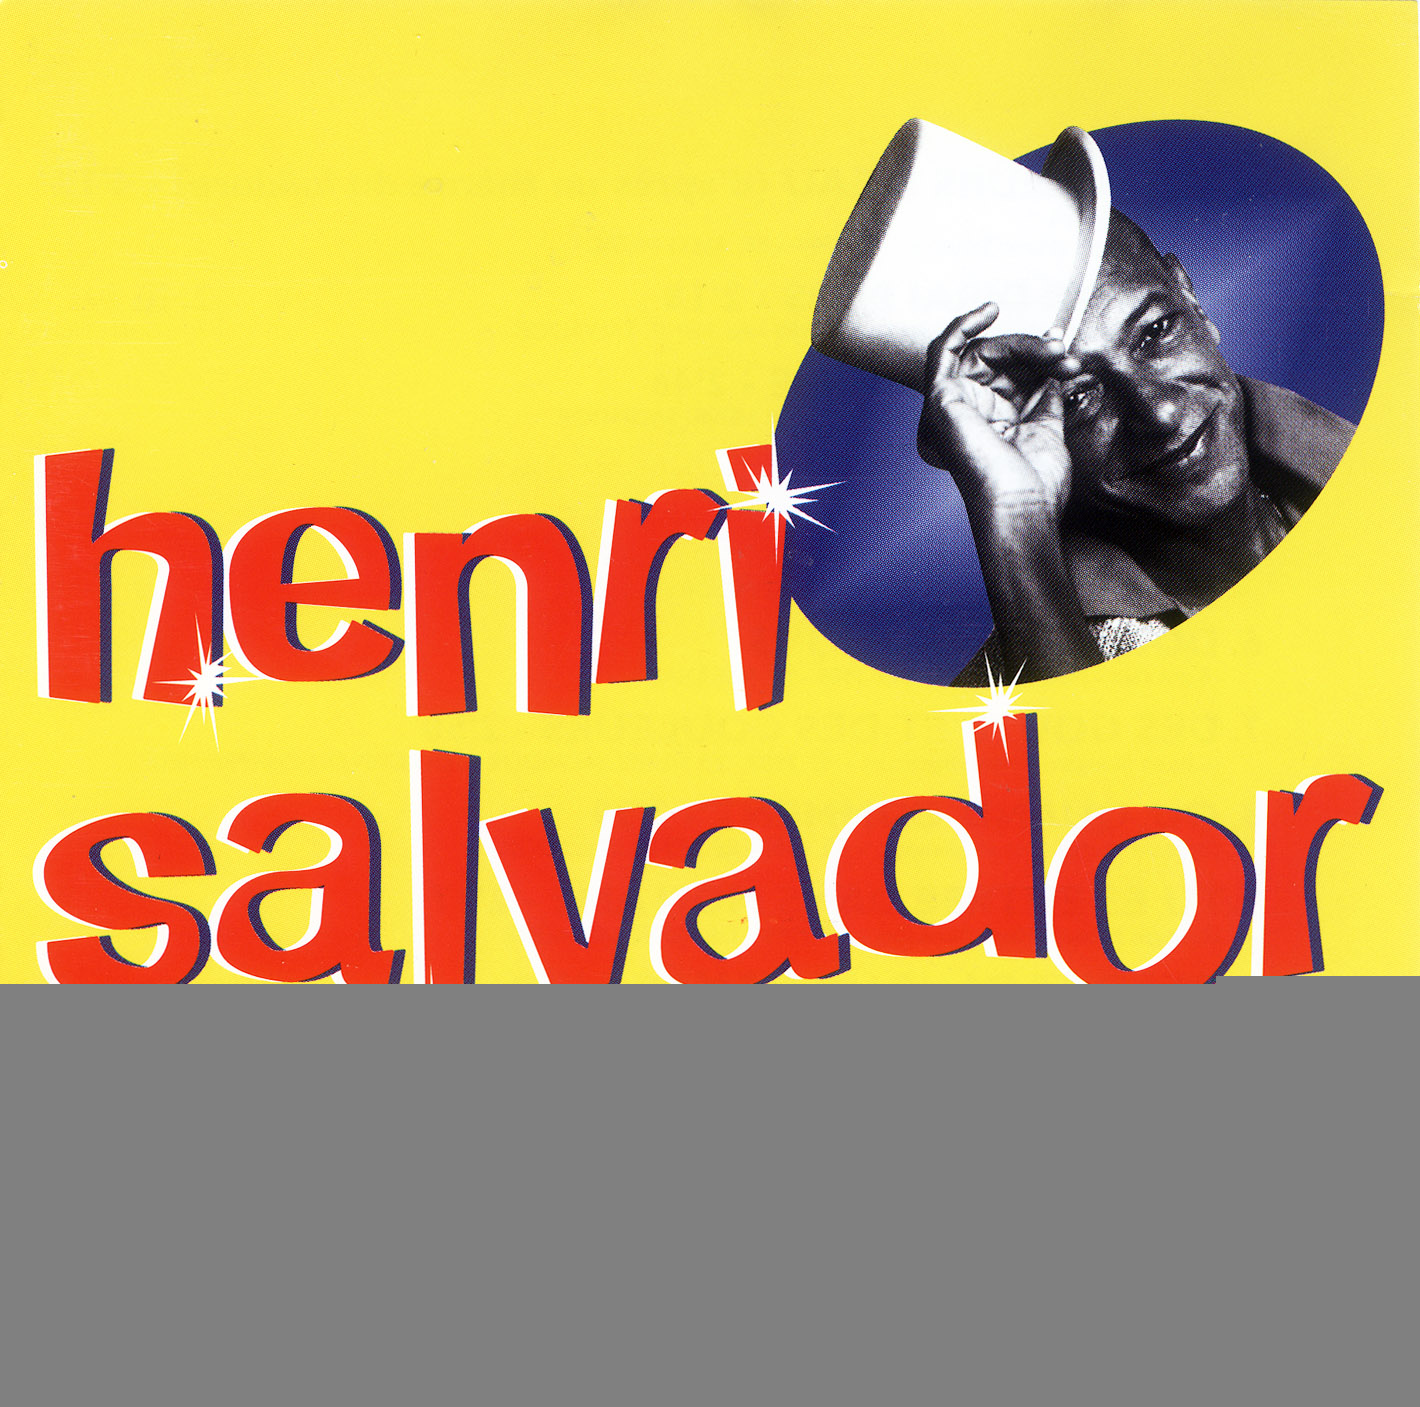 Henri Salvador, Appelez Vite Un Docteur, Piano & Vocal